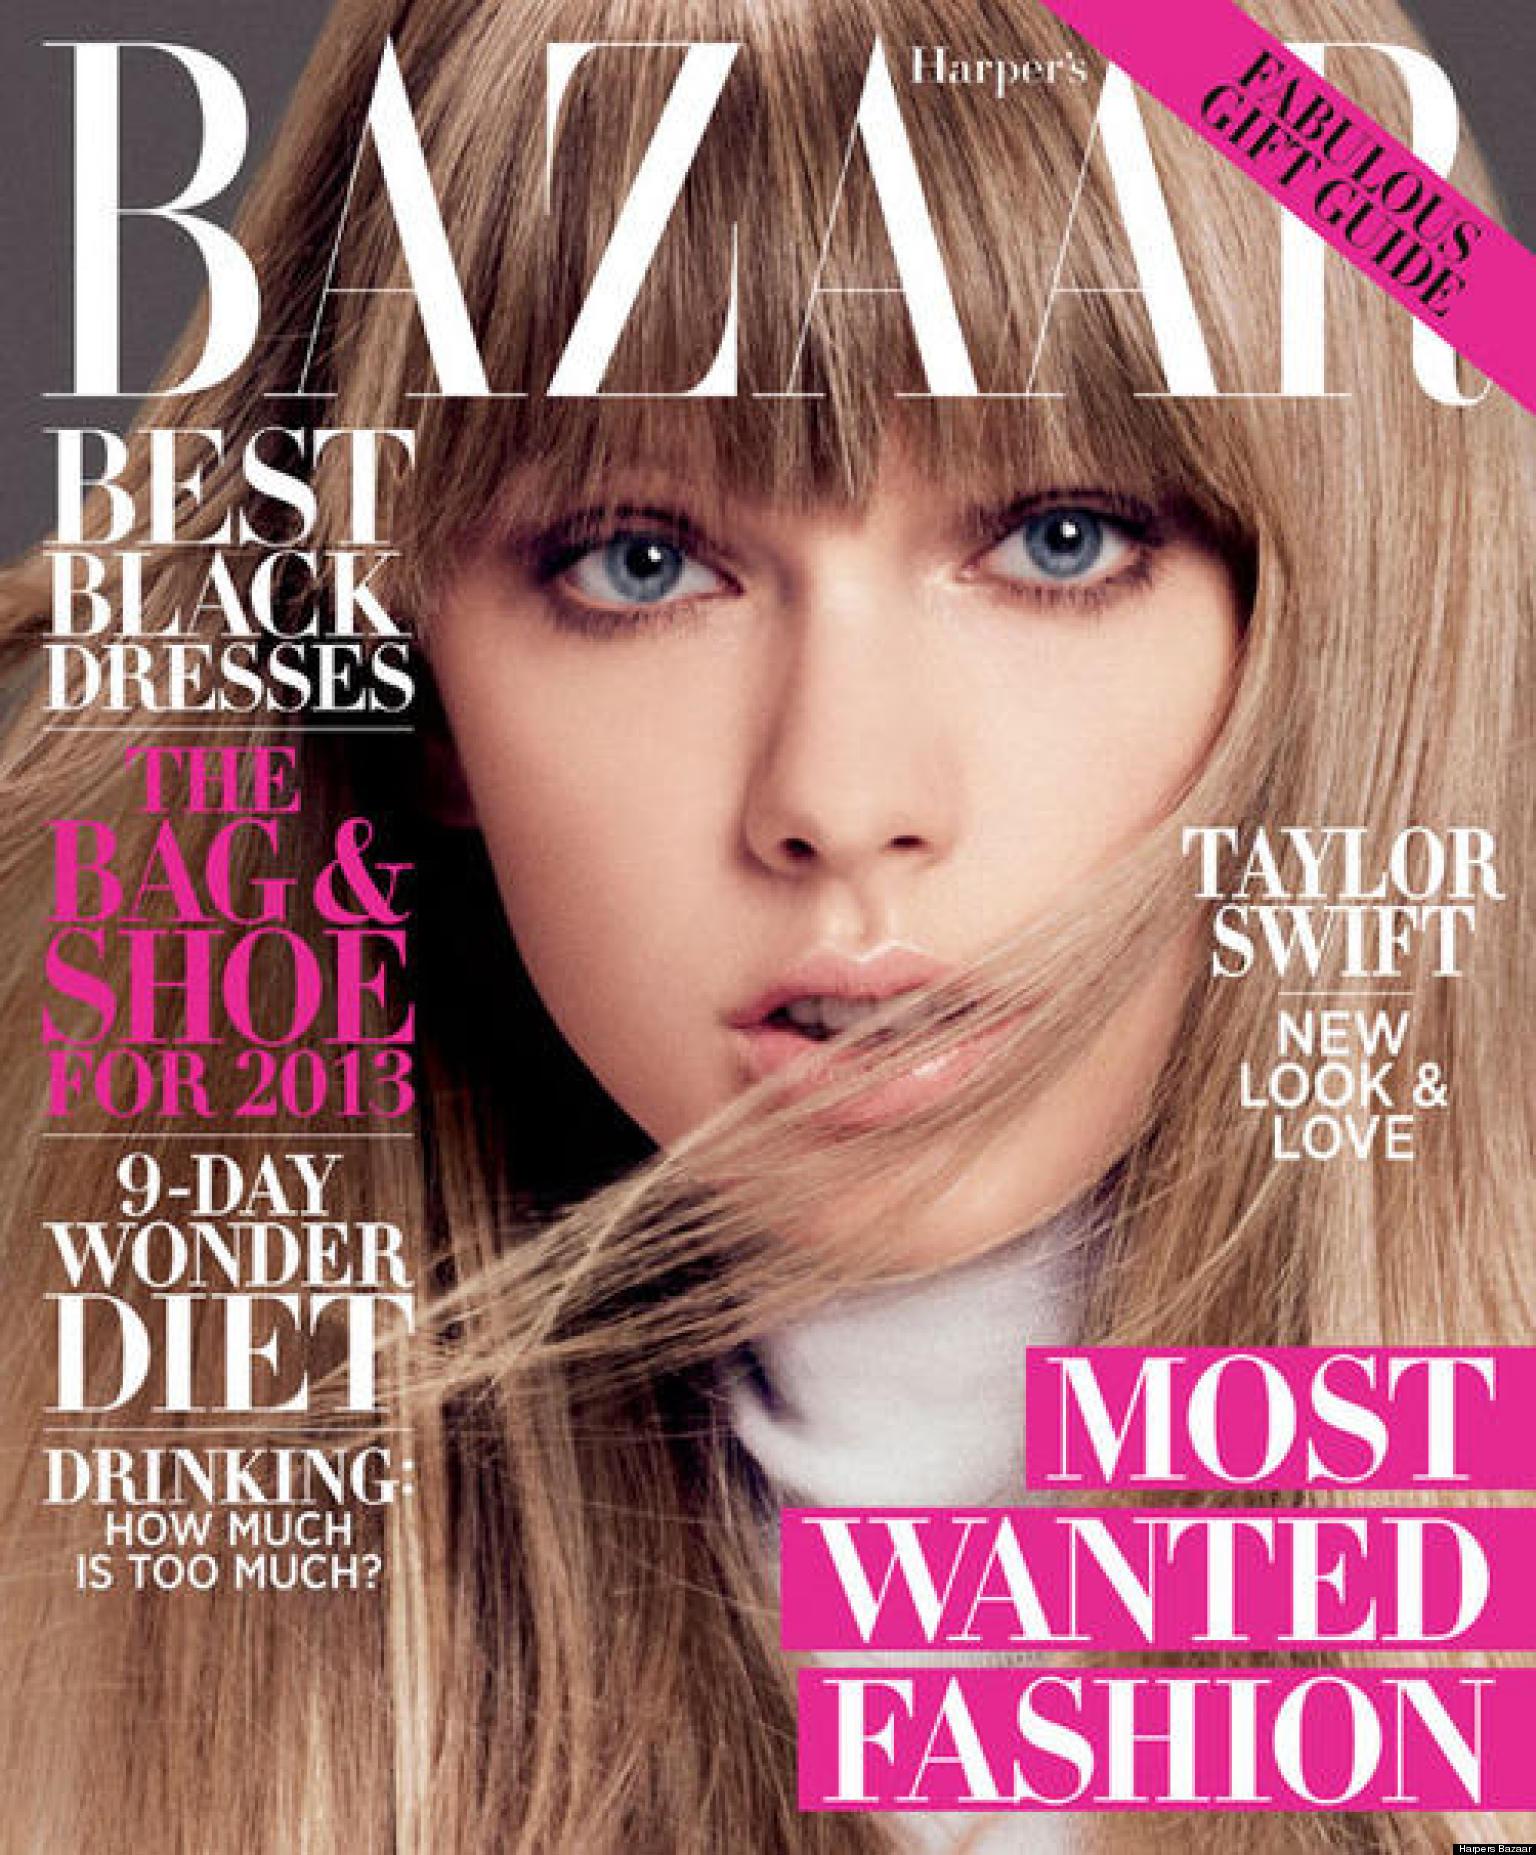 Taylor Swift Dating Rumors Make Pop Star Cry (PHOTO